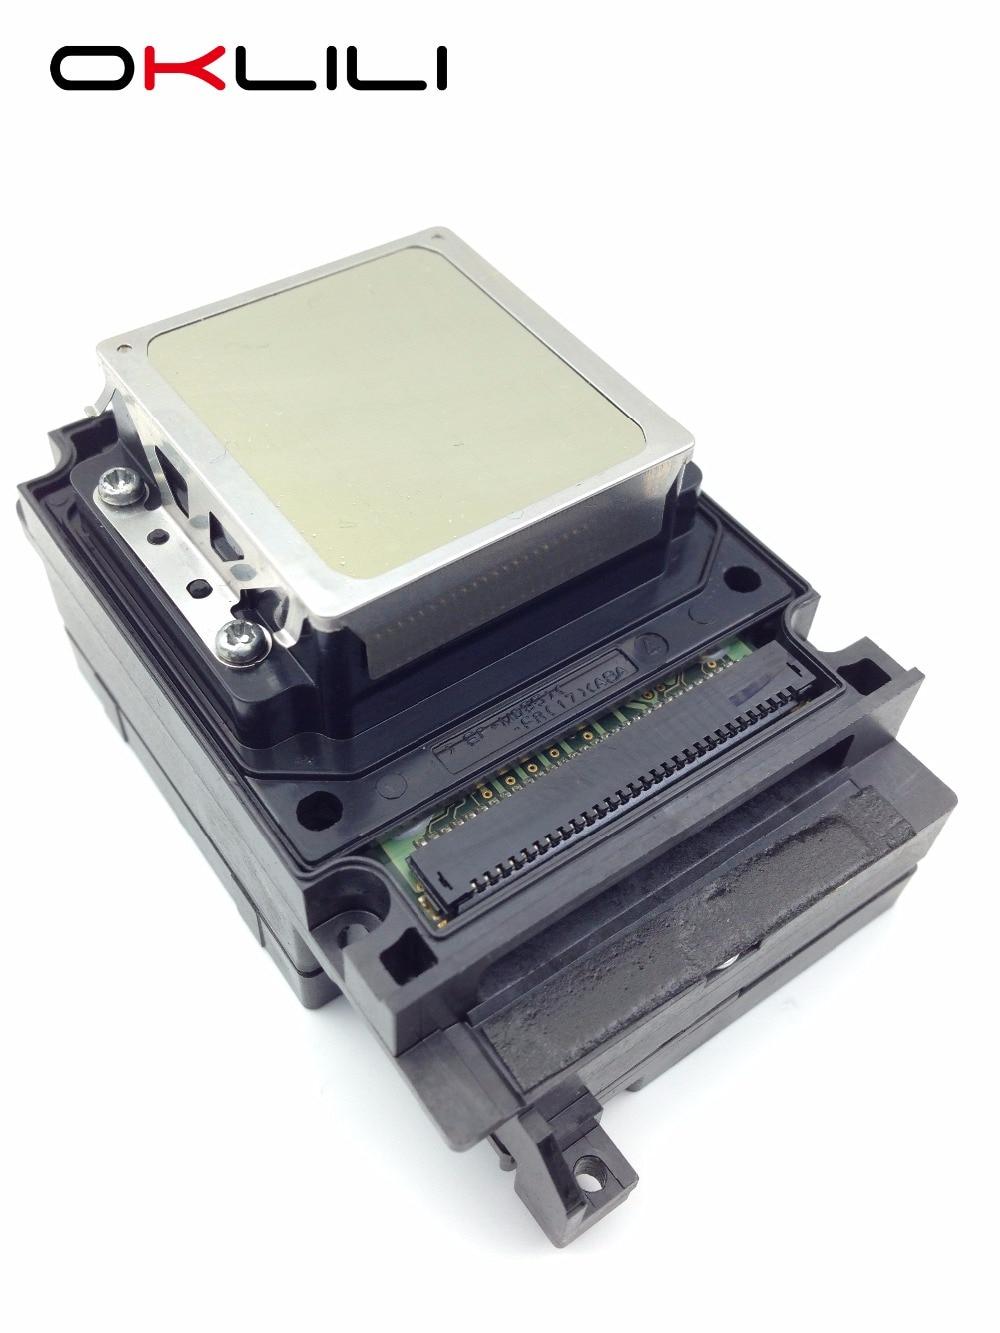 F192040 Printhead Print Head for Epson Artisan 710 730 810 730 PX800FW TX800FW PX810FW PX700W TX700W PX710W TX710W PX720WD